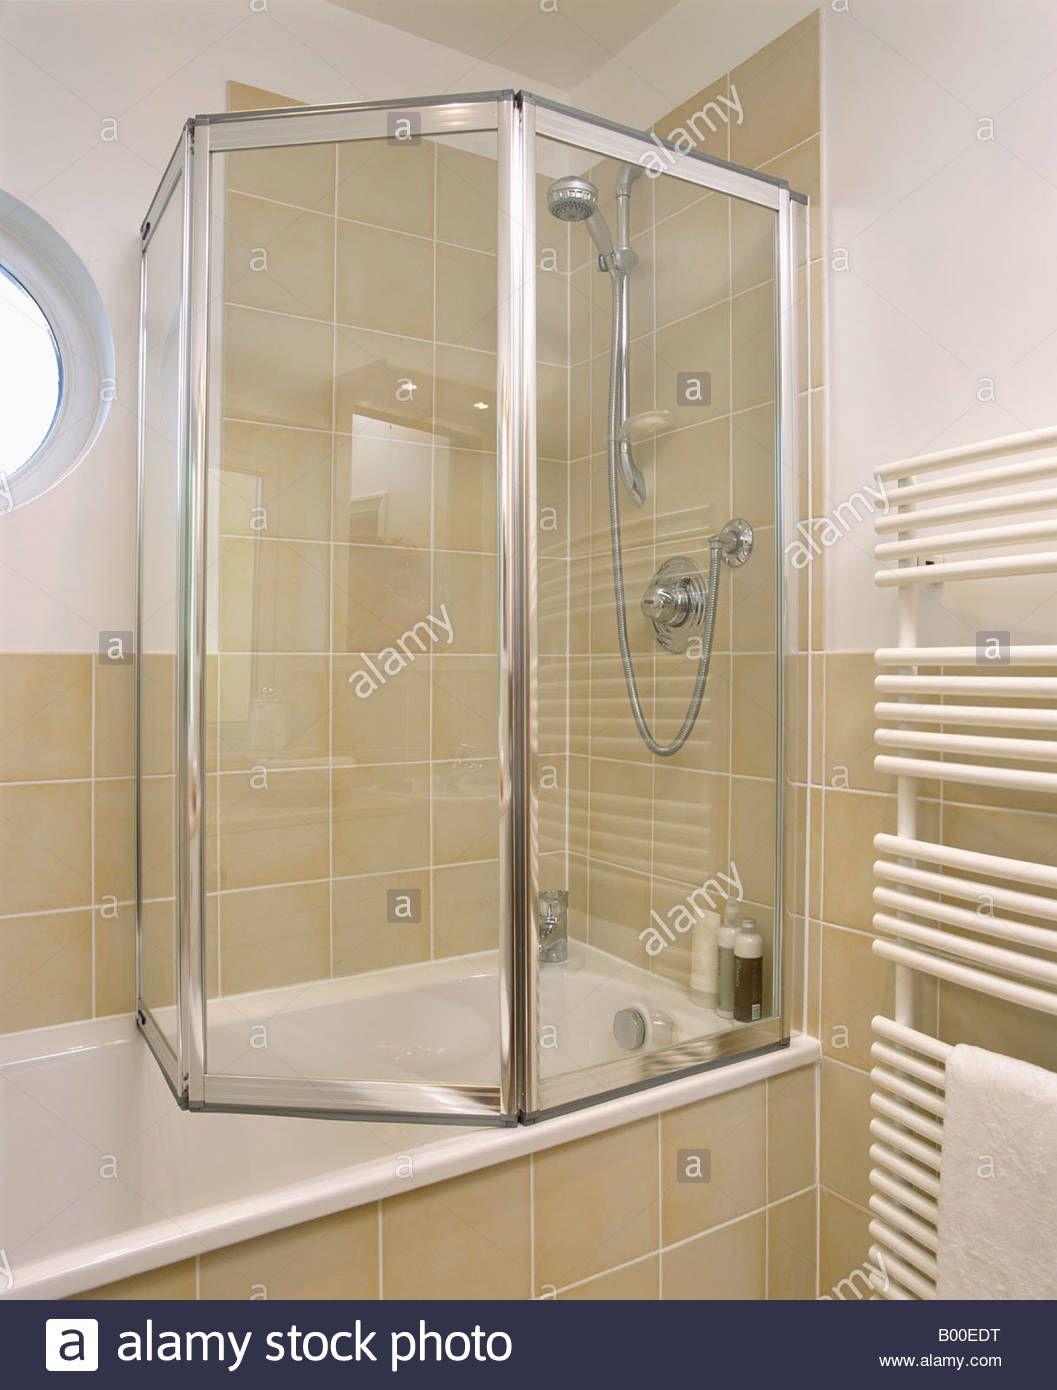 stock photo folding glass shower doors bath modern bathroom bathtub manufacturers suppliers & stock photo folding glass shower doors bath modern bathroom bathtub ...